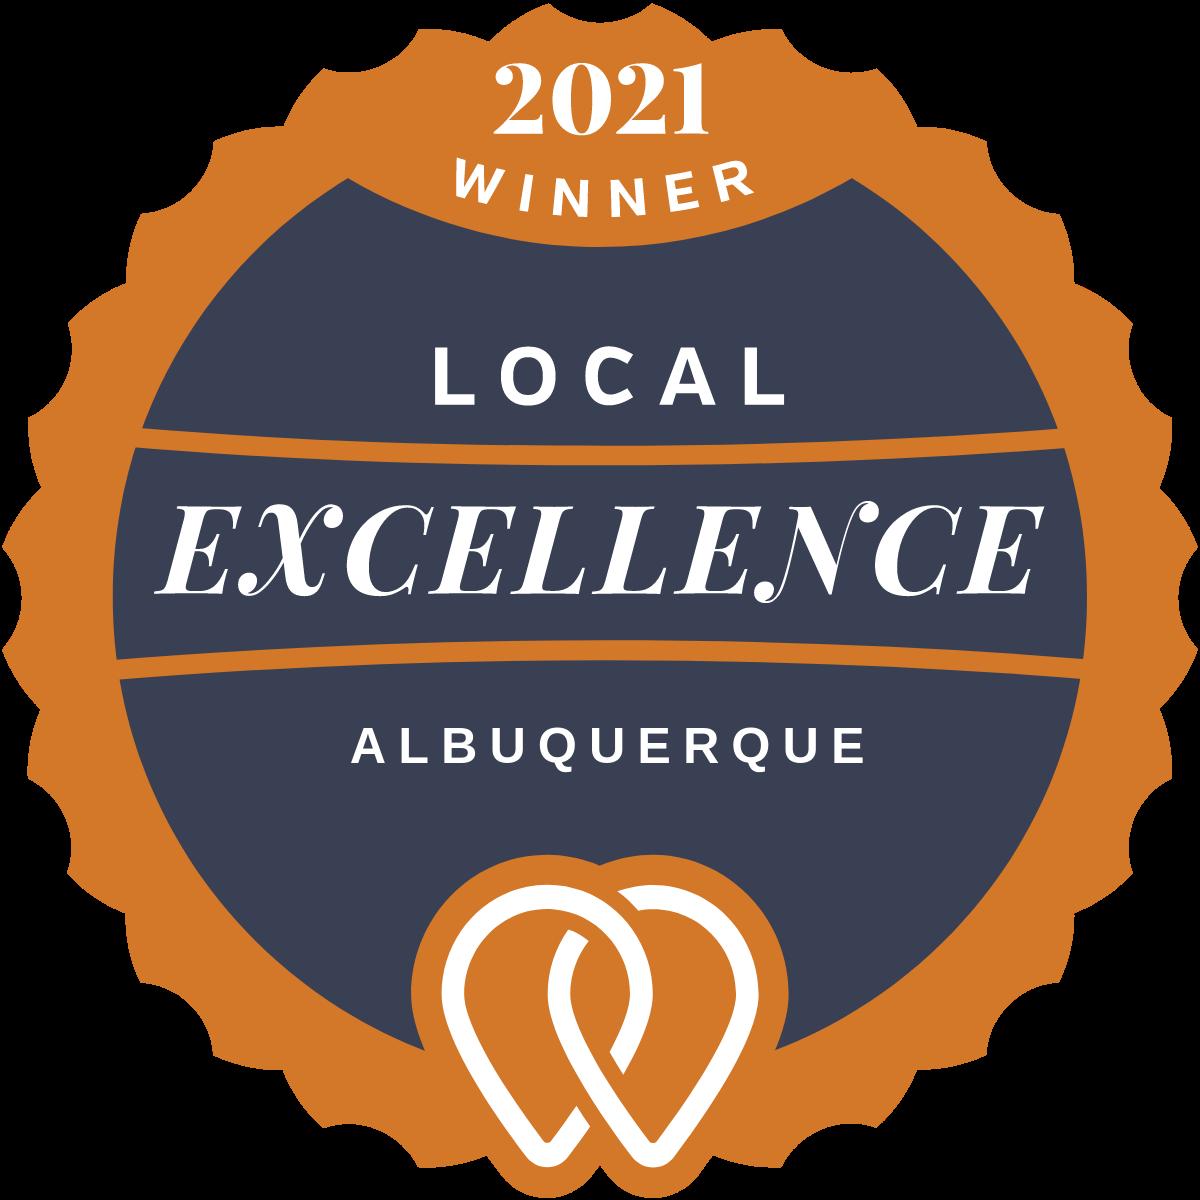 2021 Local Excellence Winner in Albuquerque, NM